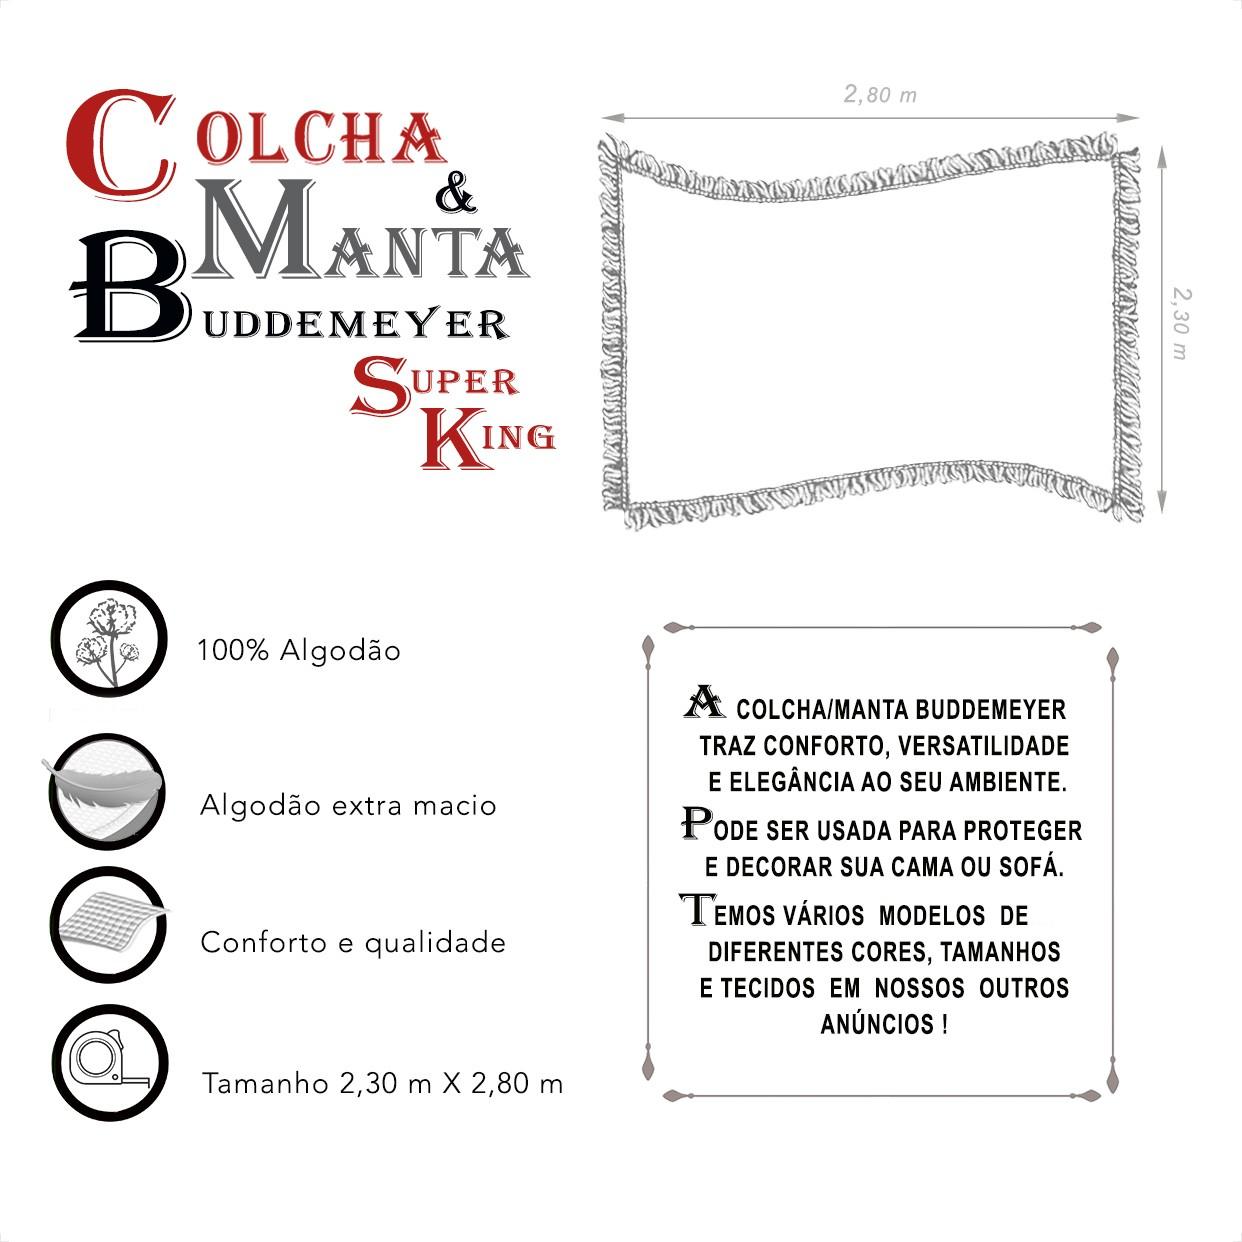 Manta e Colcha Buddemeyer Super King Goiaba 2,30m x 2,80m